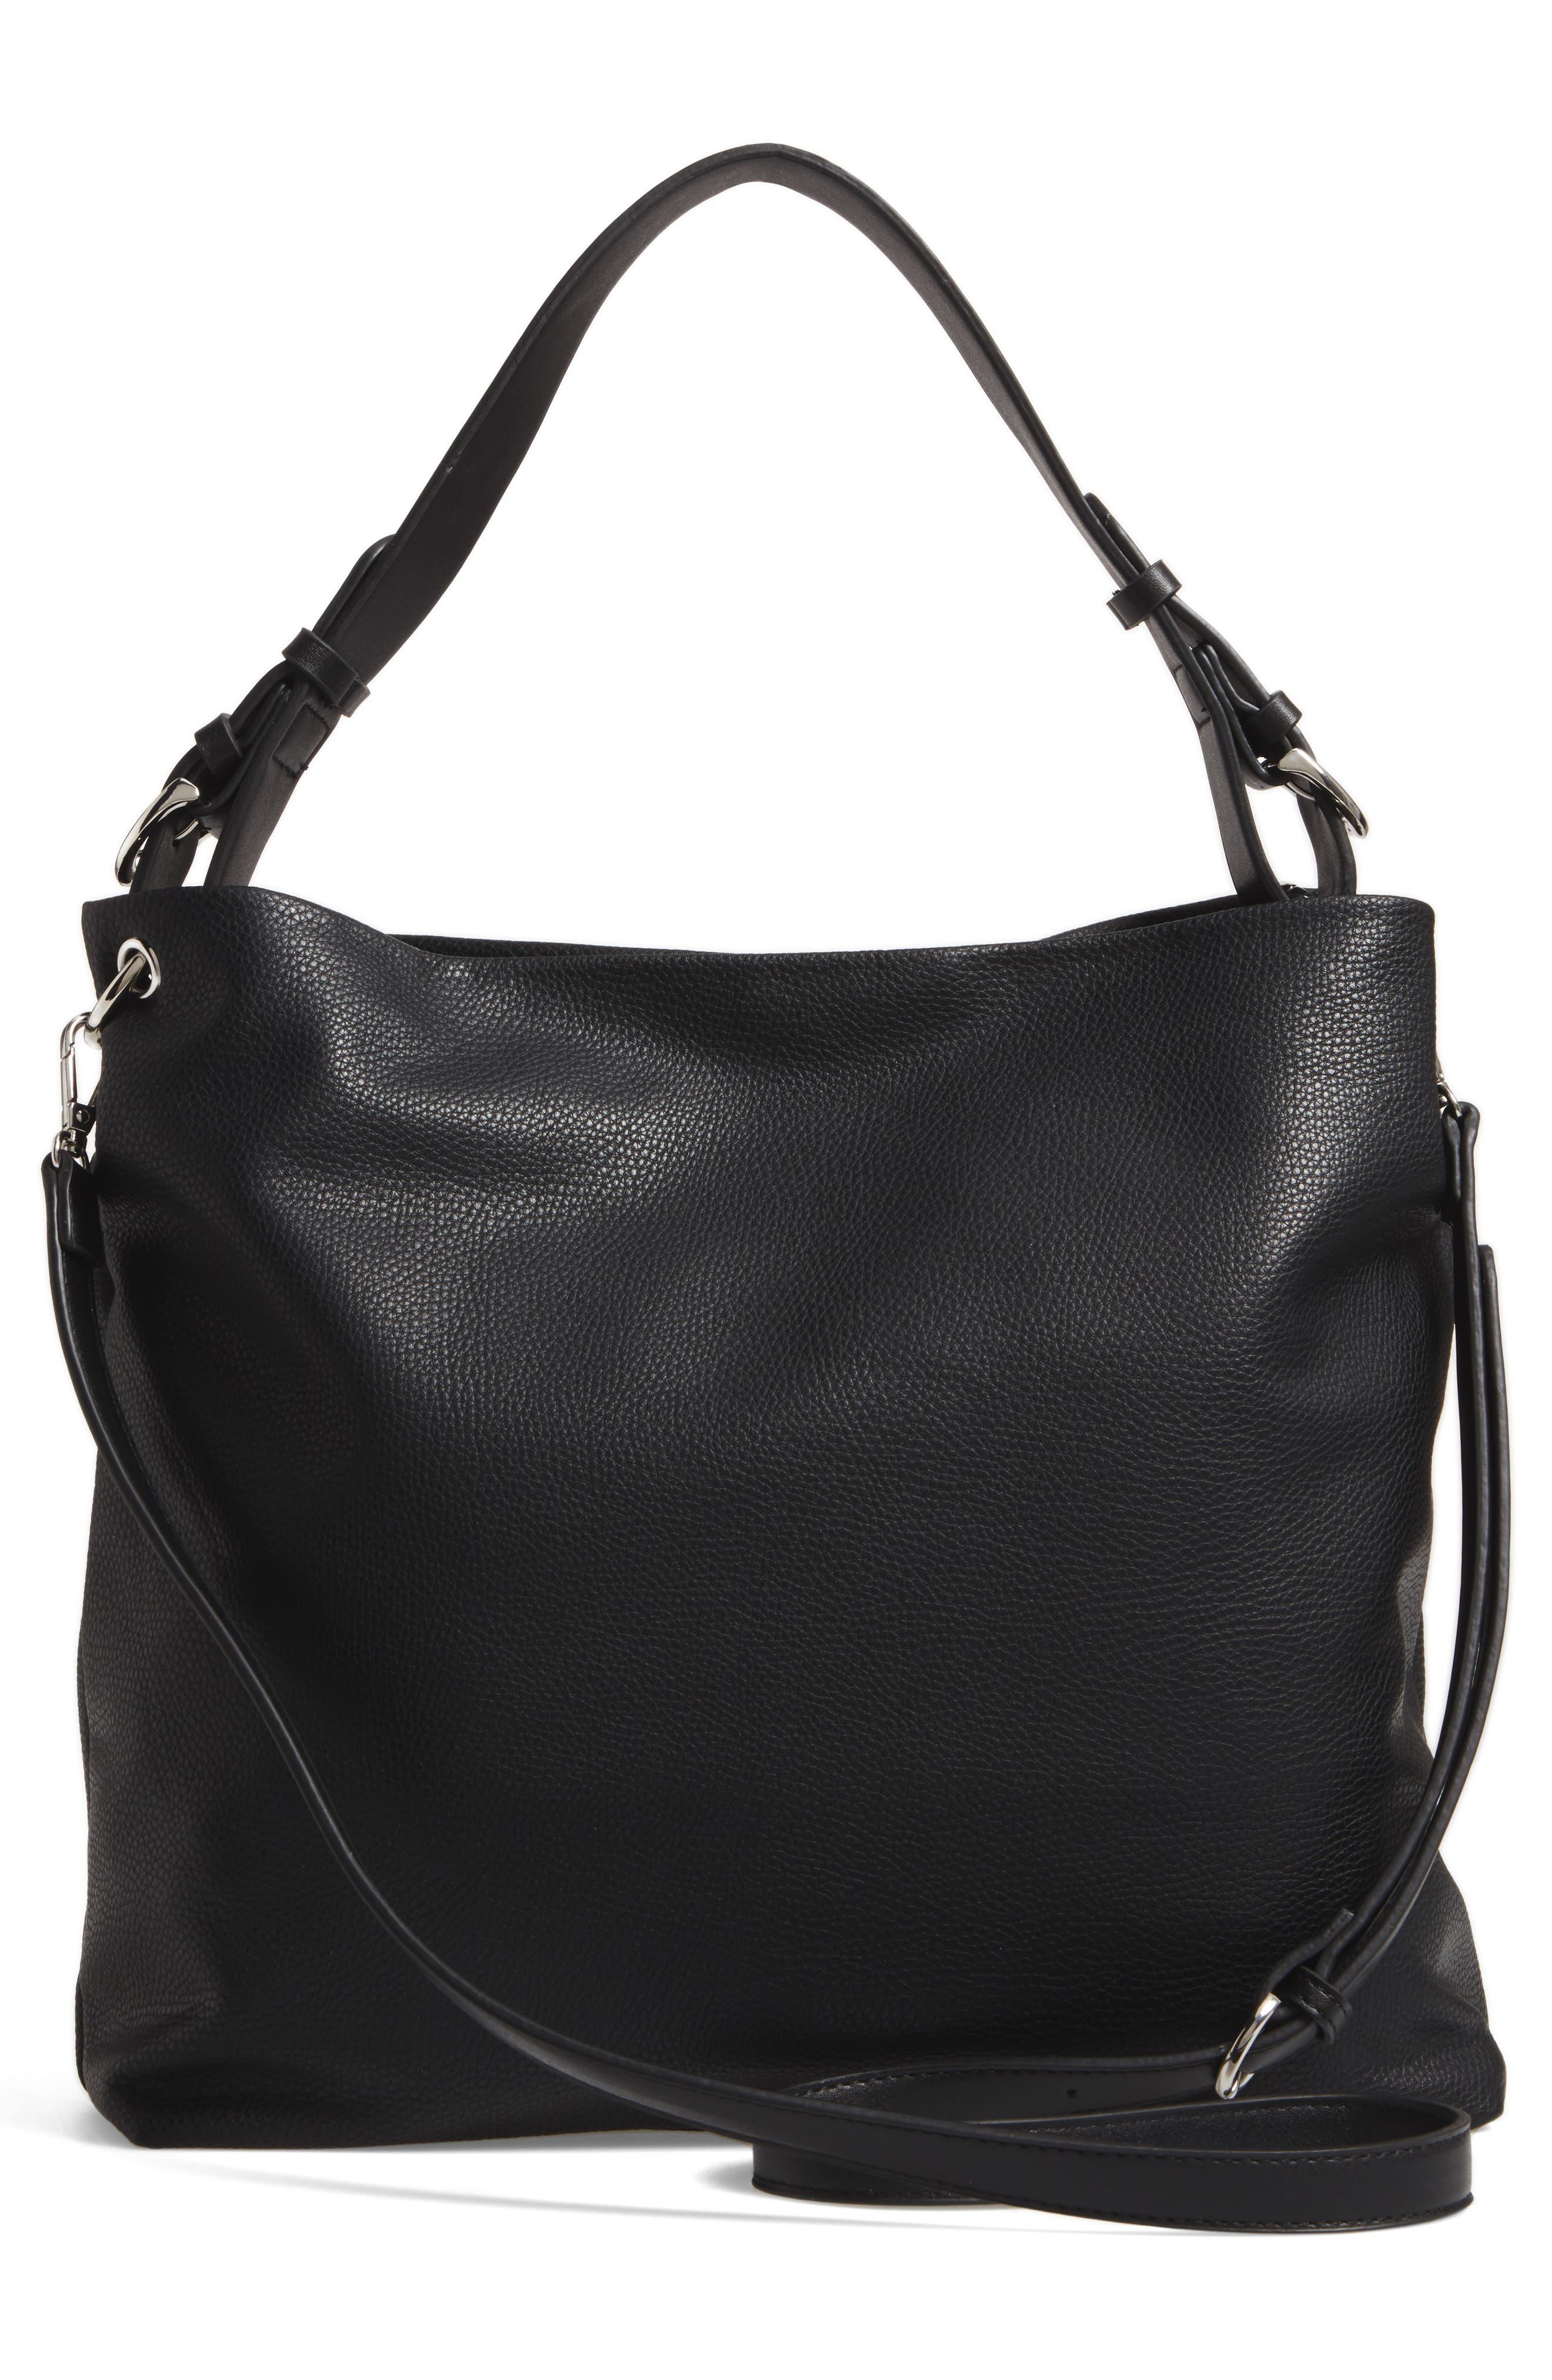 Taylor Faux Leather Shoulder Bag,                             Alternate thumbnail 7, color,